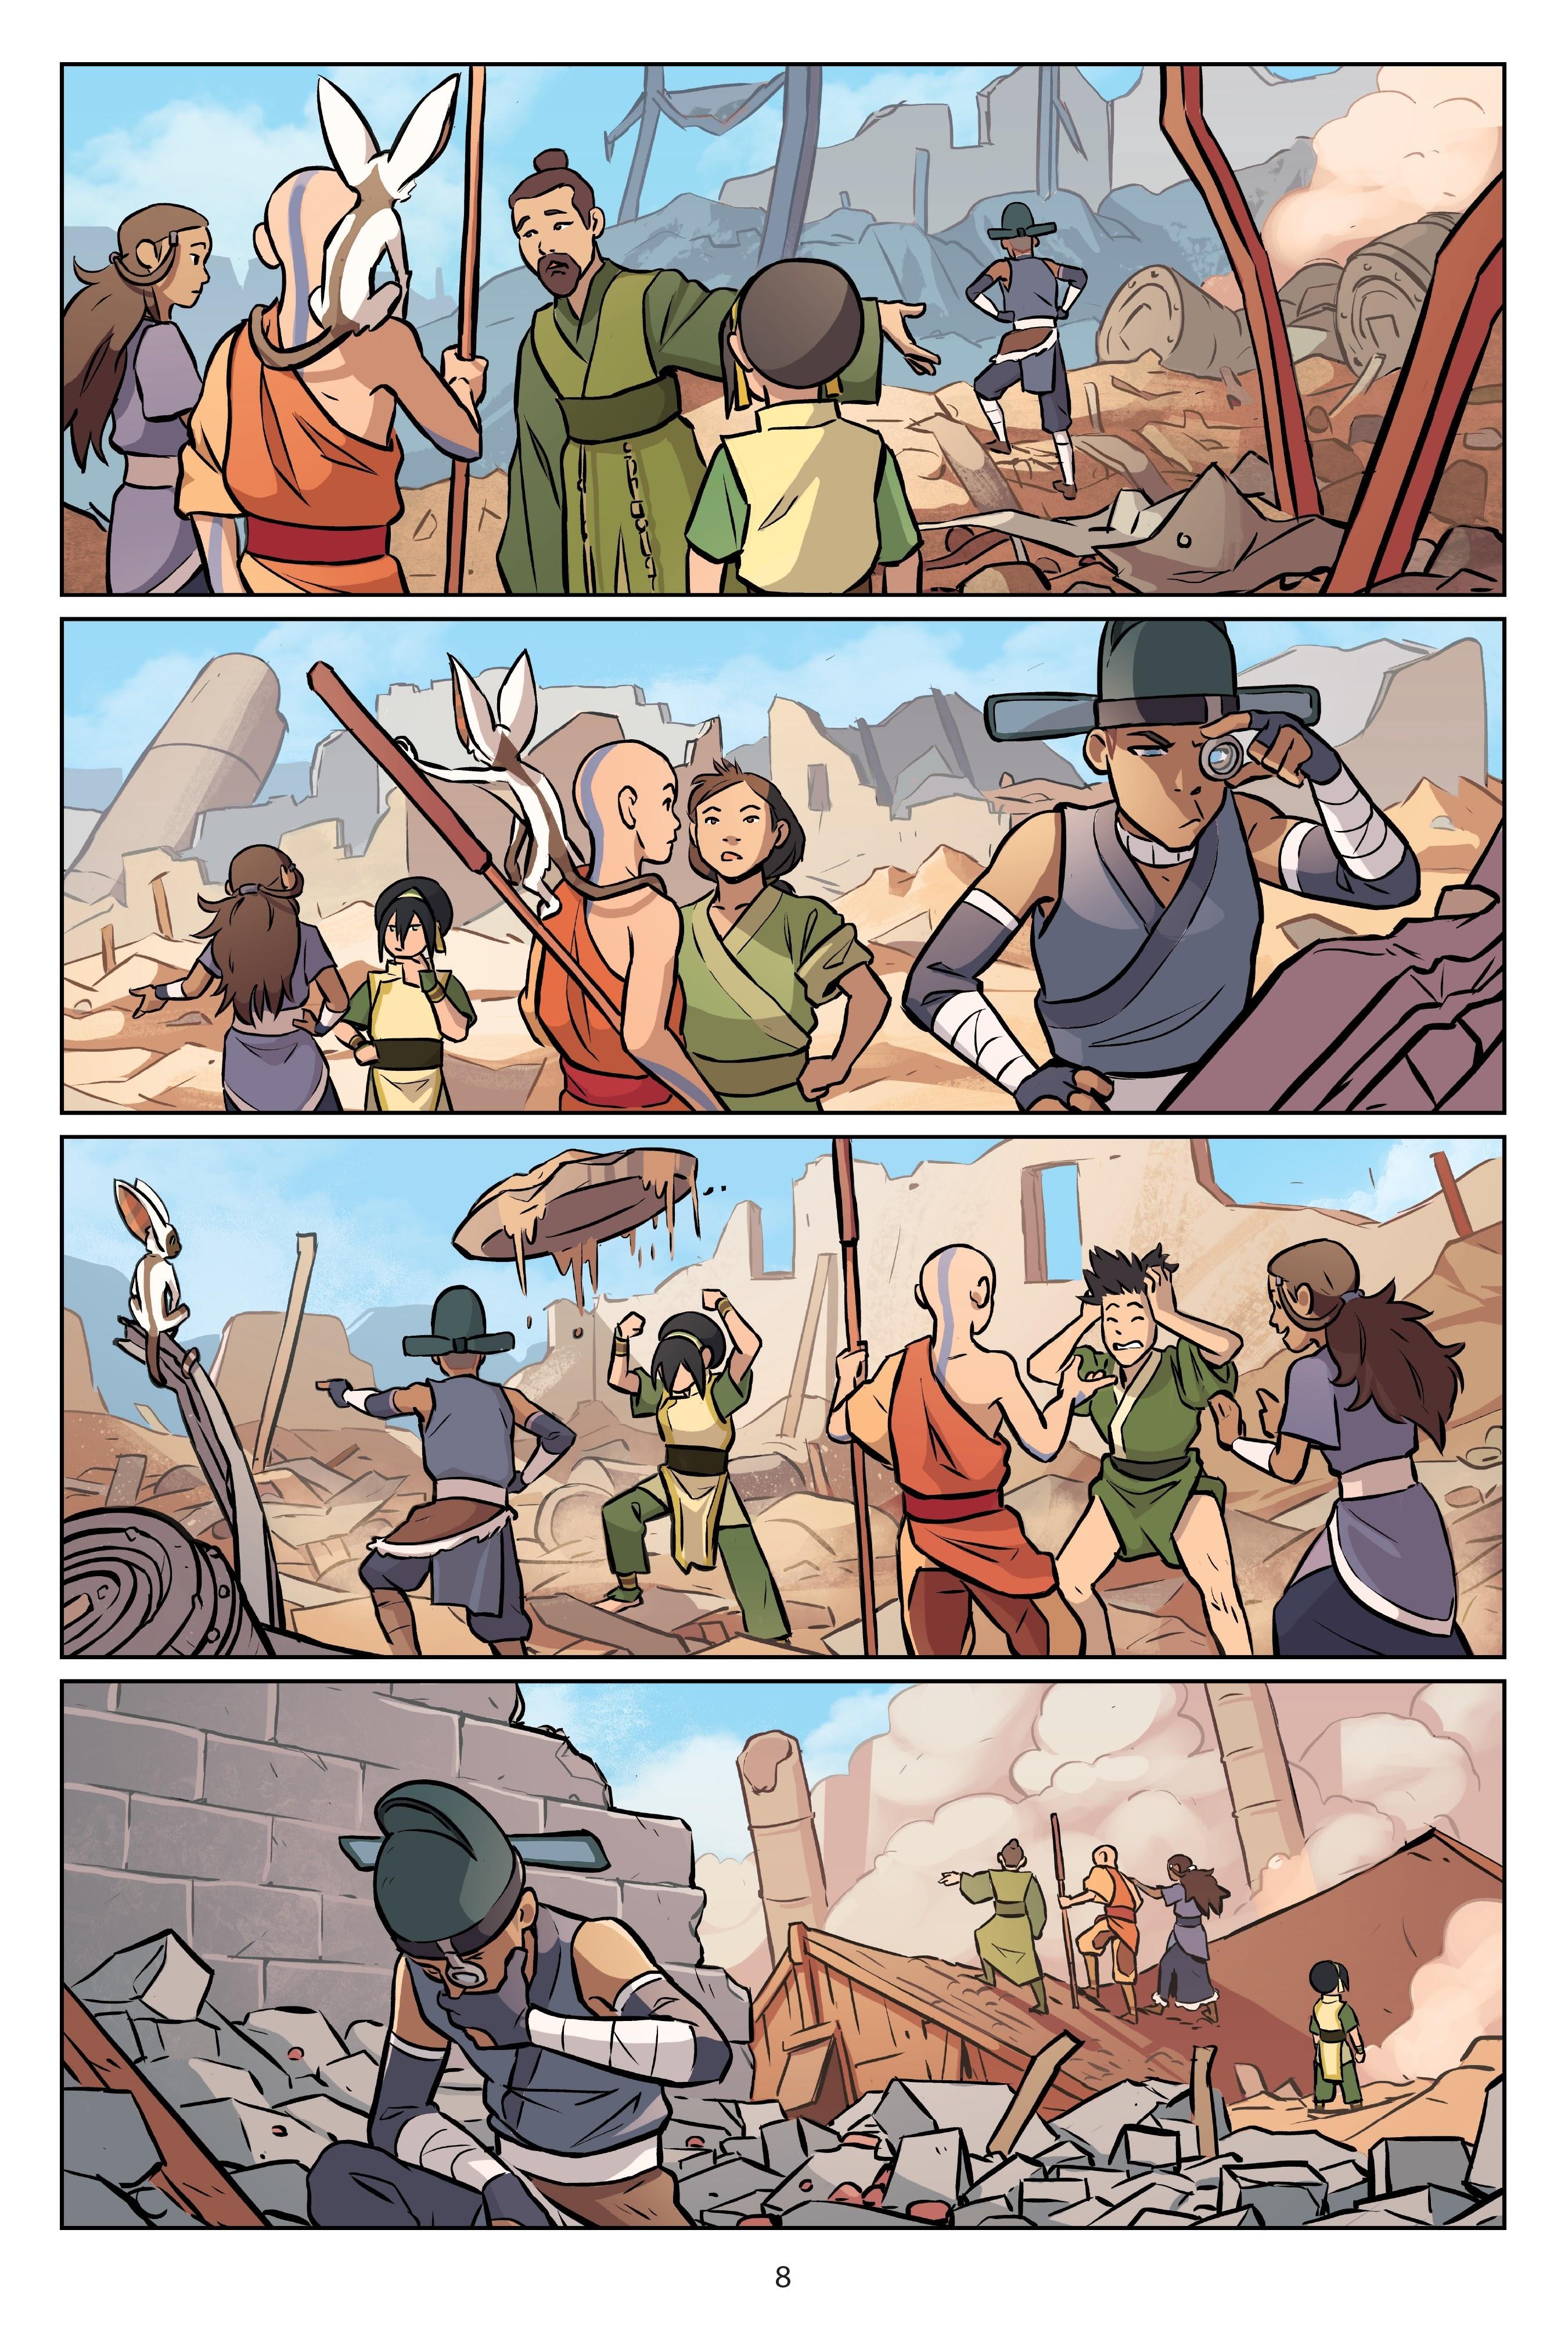 Nickelodeon Avatar: The Last Airbender - Imbalance TPB_2 Page 8